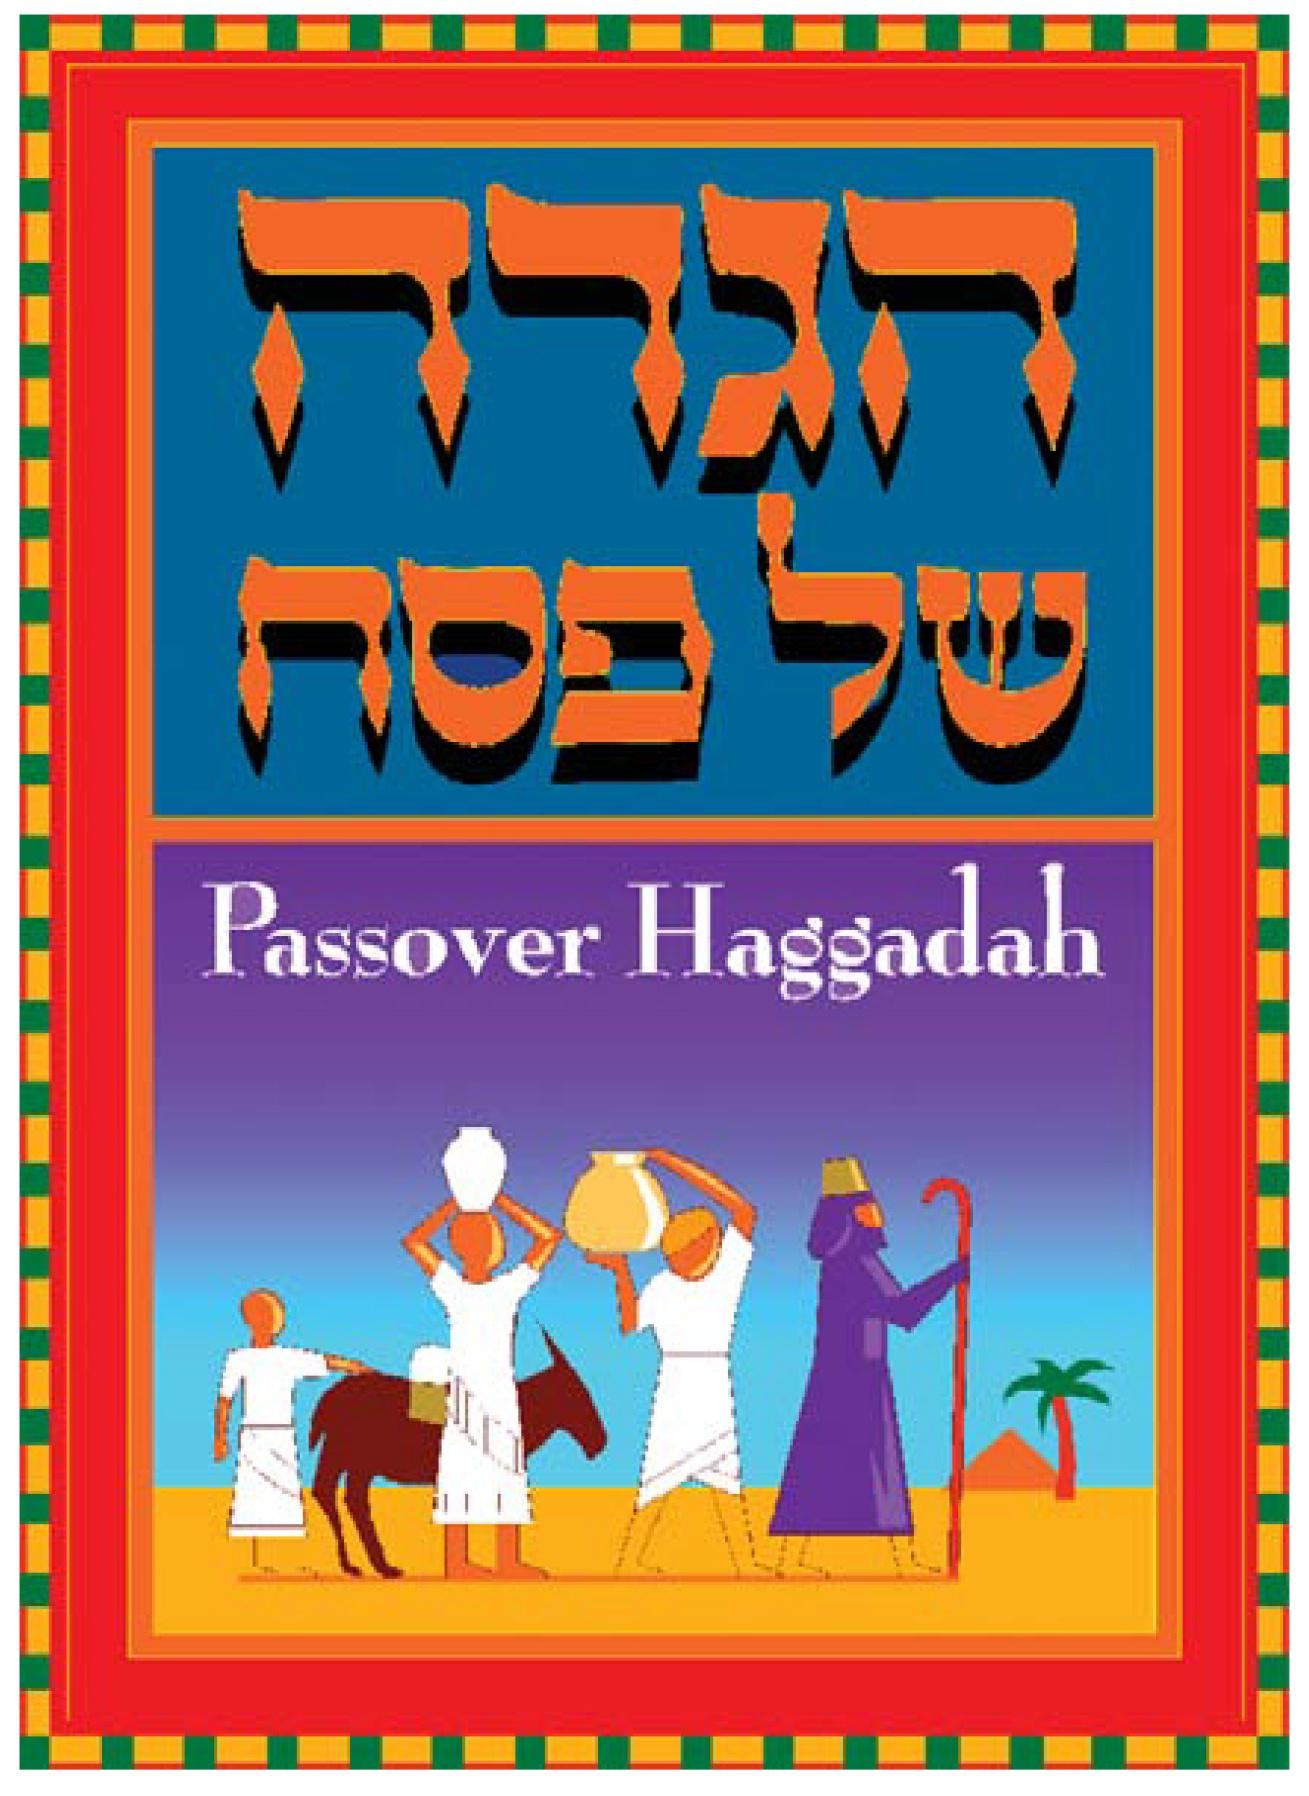 Passover Haggadah - Heart Of Wisdom Homeschool Blog - Free Printable Messianic Haggadah